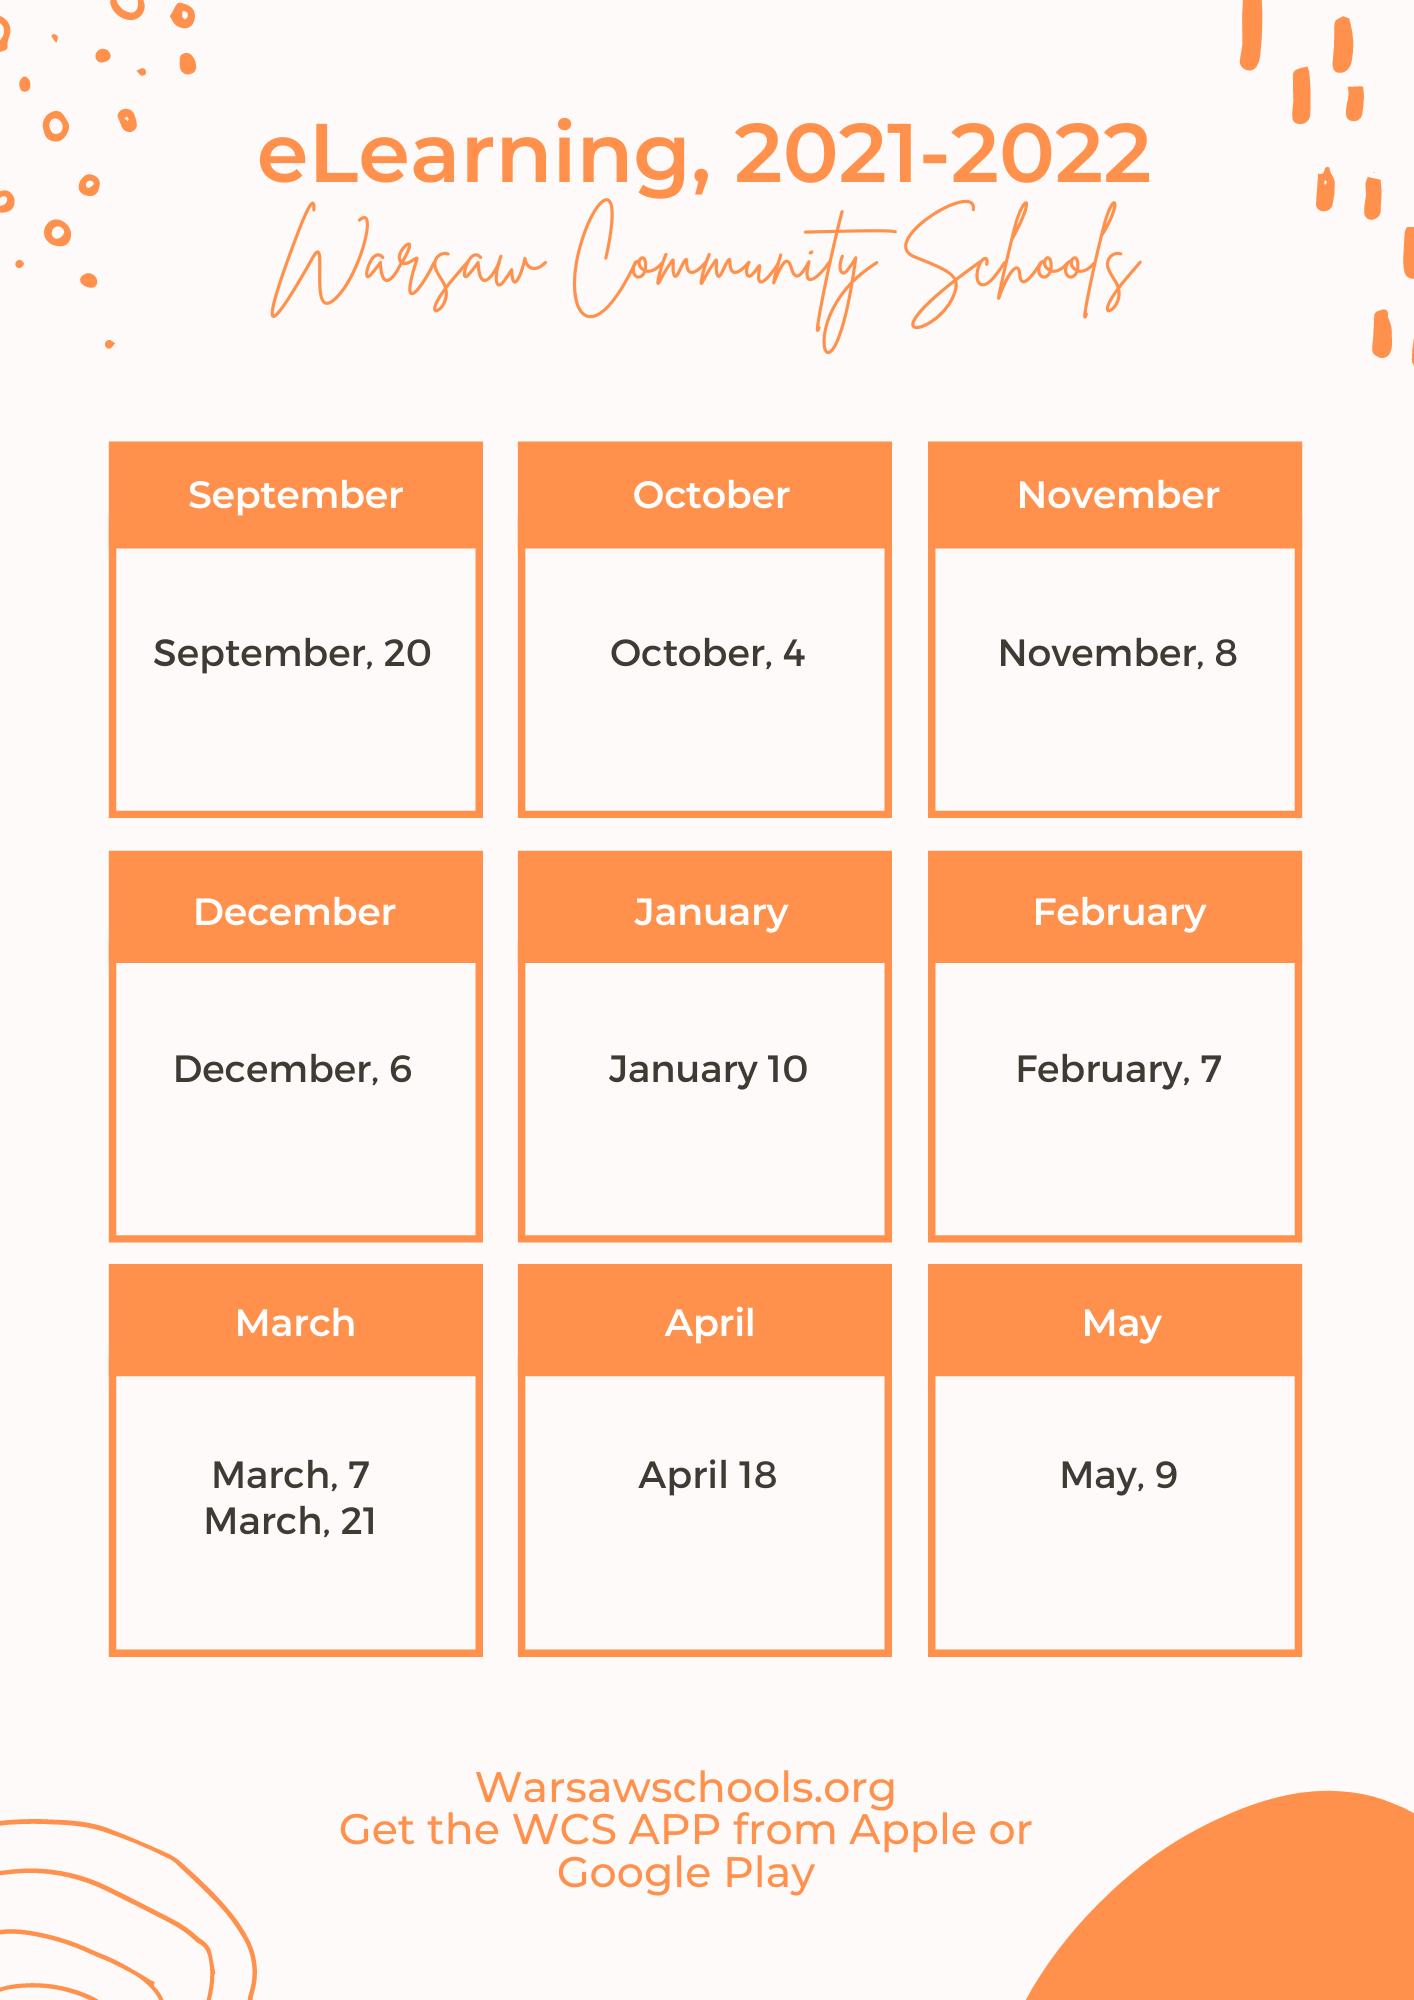 eLearning Days Calendar